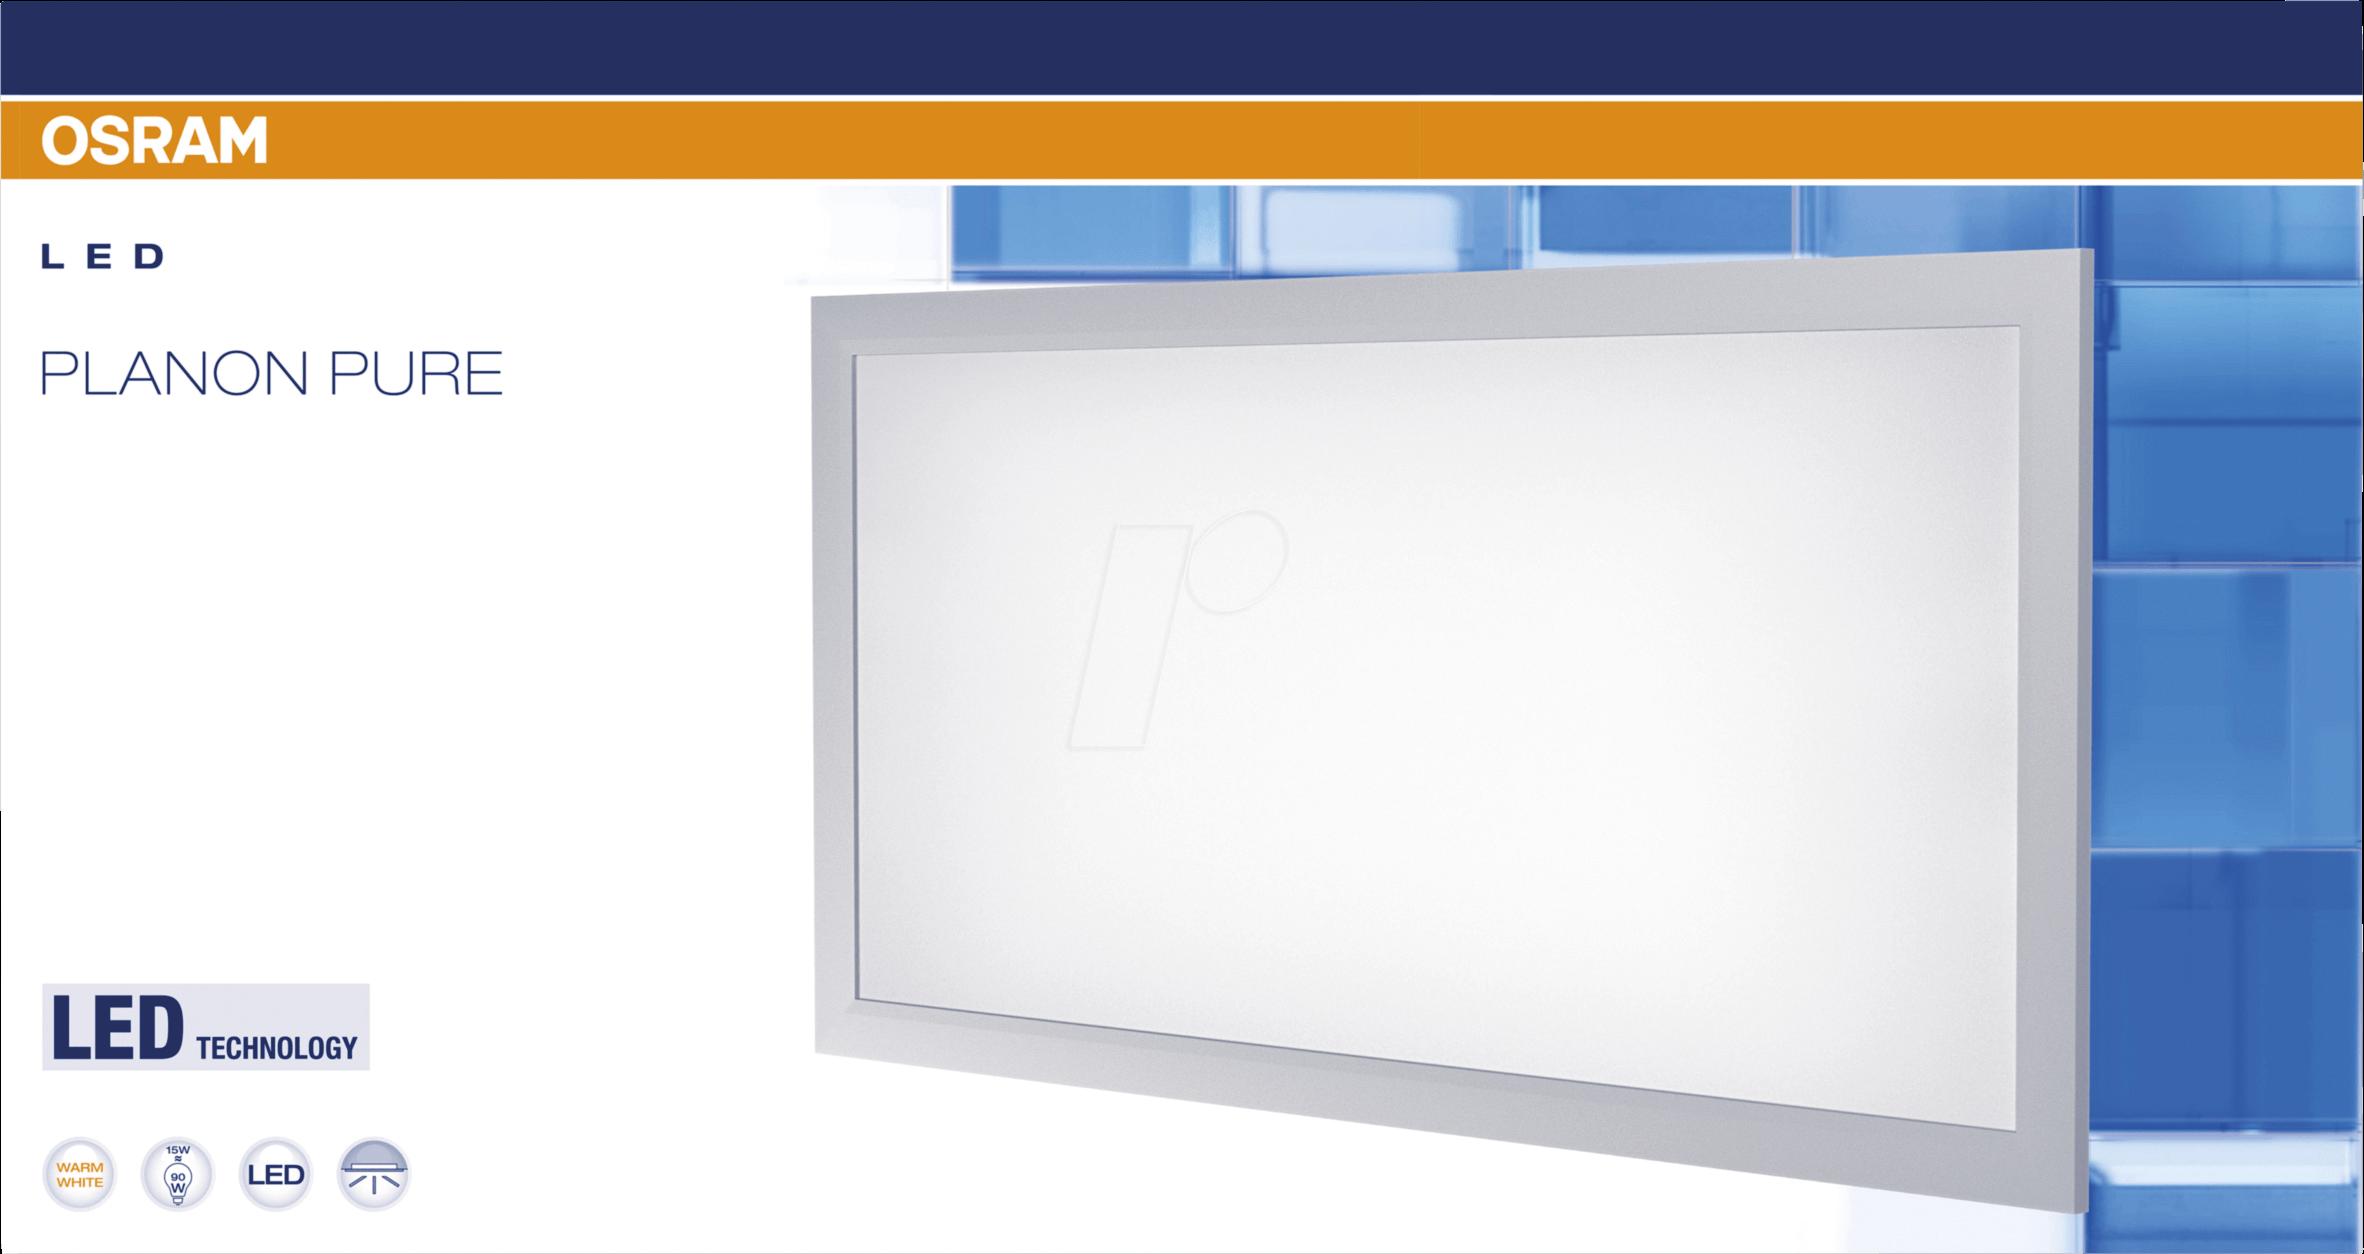 OSR 405807503540 - LED-Panel, PLANON PURE, 15 W, 1400 lm, 4000 K